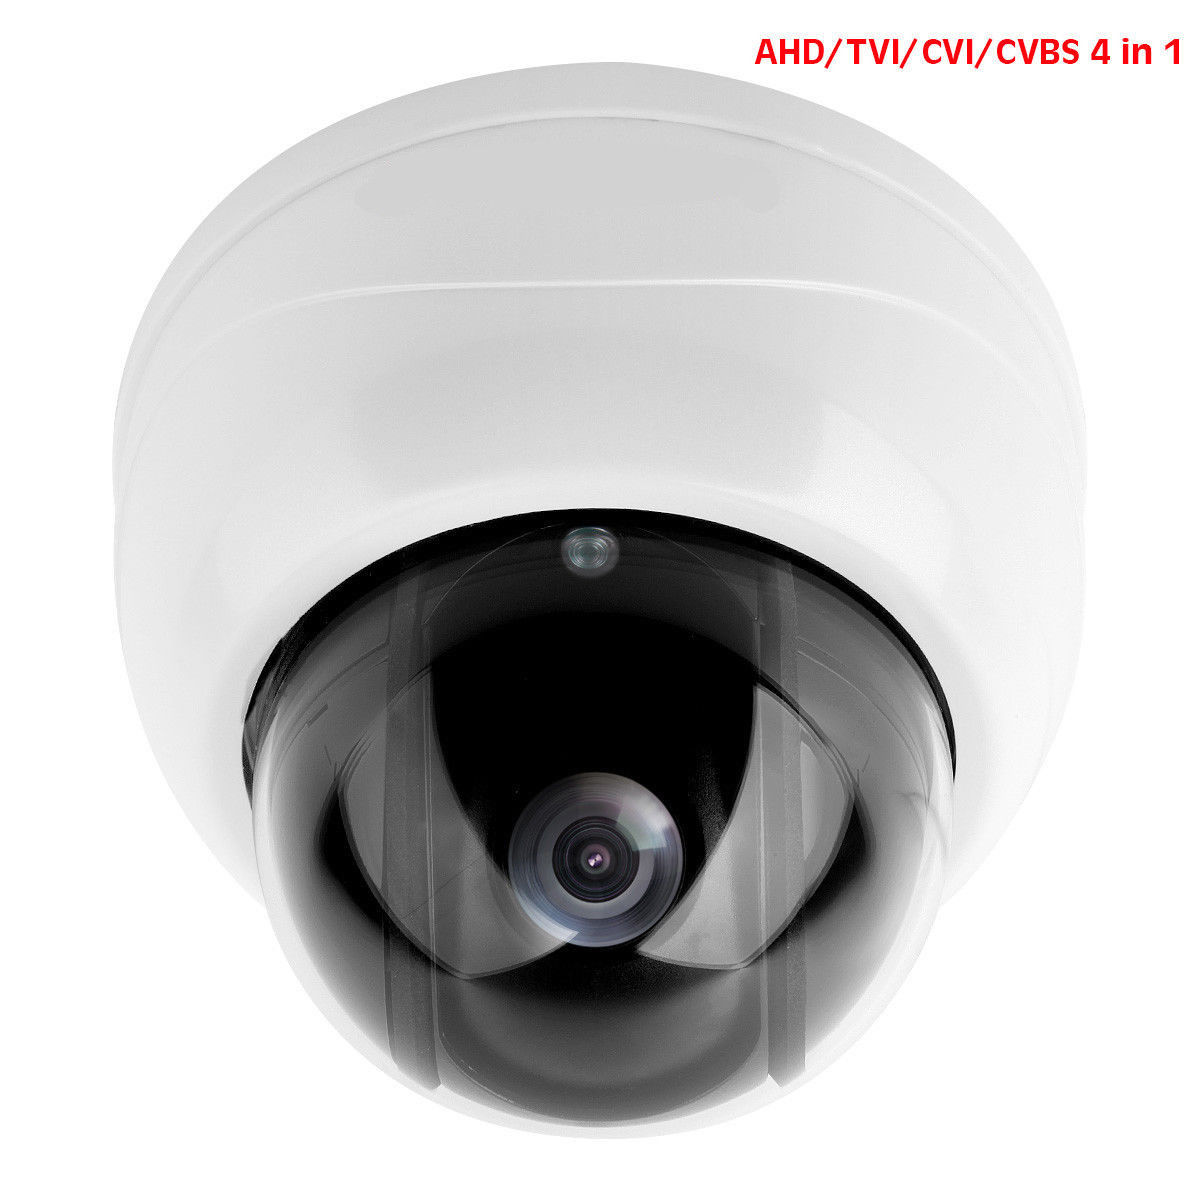 2.5'' 3X ZOOM HD 1080P 2.0MP Mini PTZ CVBS-AHD-TVI-CVI Dome Security Camera IR 2 5 mini metal valdalproof 4 in 1 ahd tvi cvi cvbs hd cctv ptz dome camera 3x optical zoom 2mp 1080p full hd ahd ptz cam